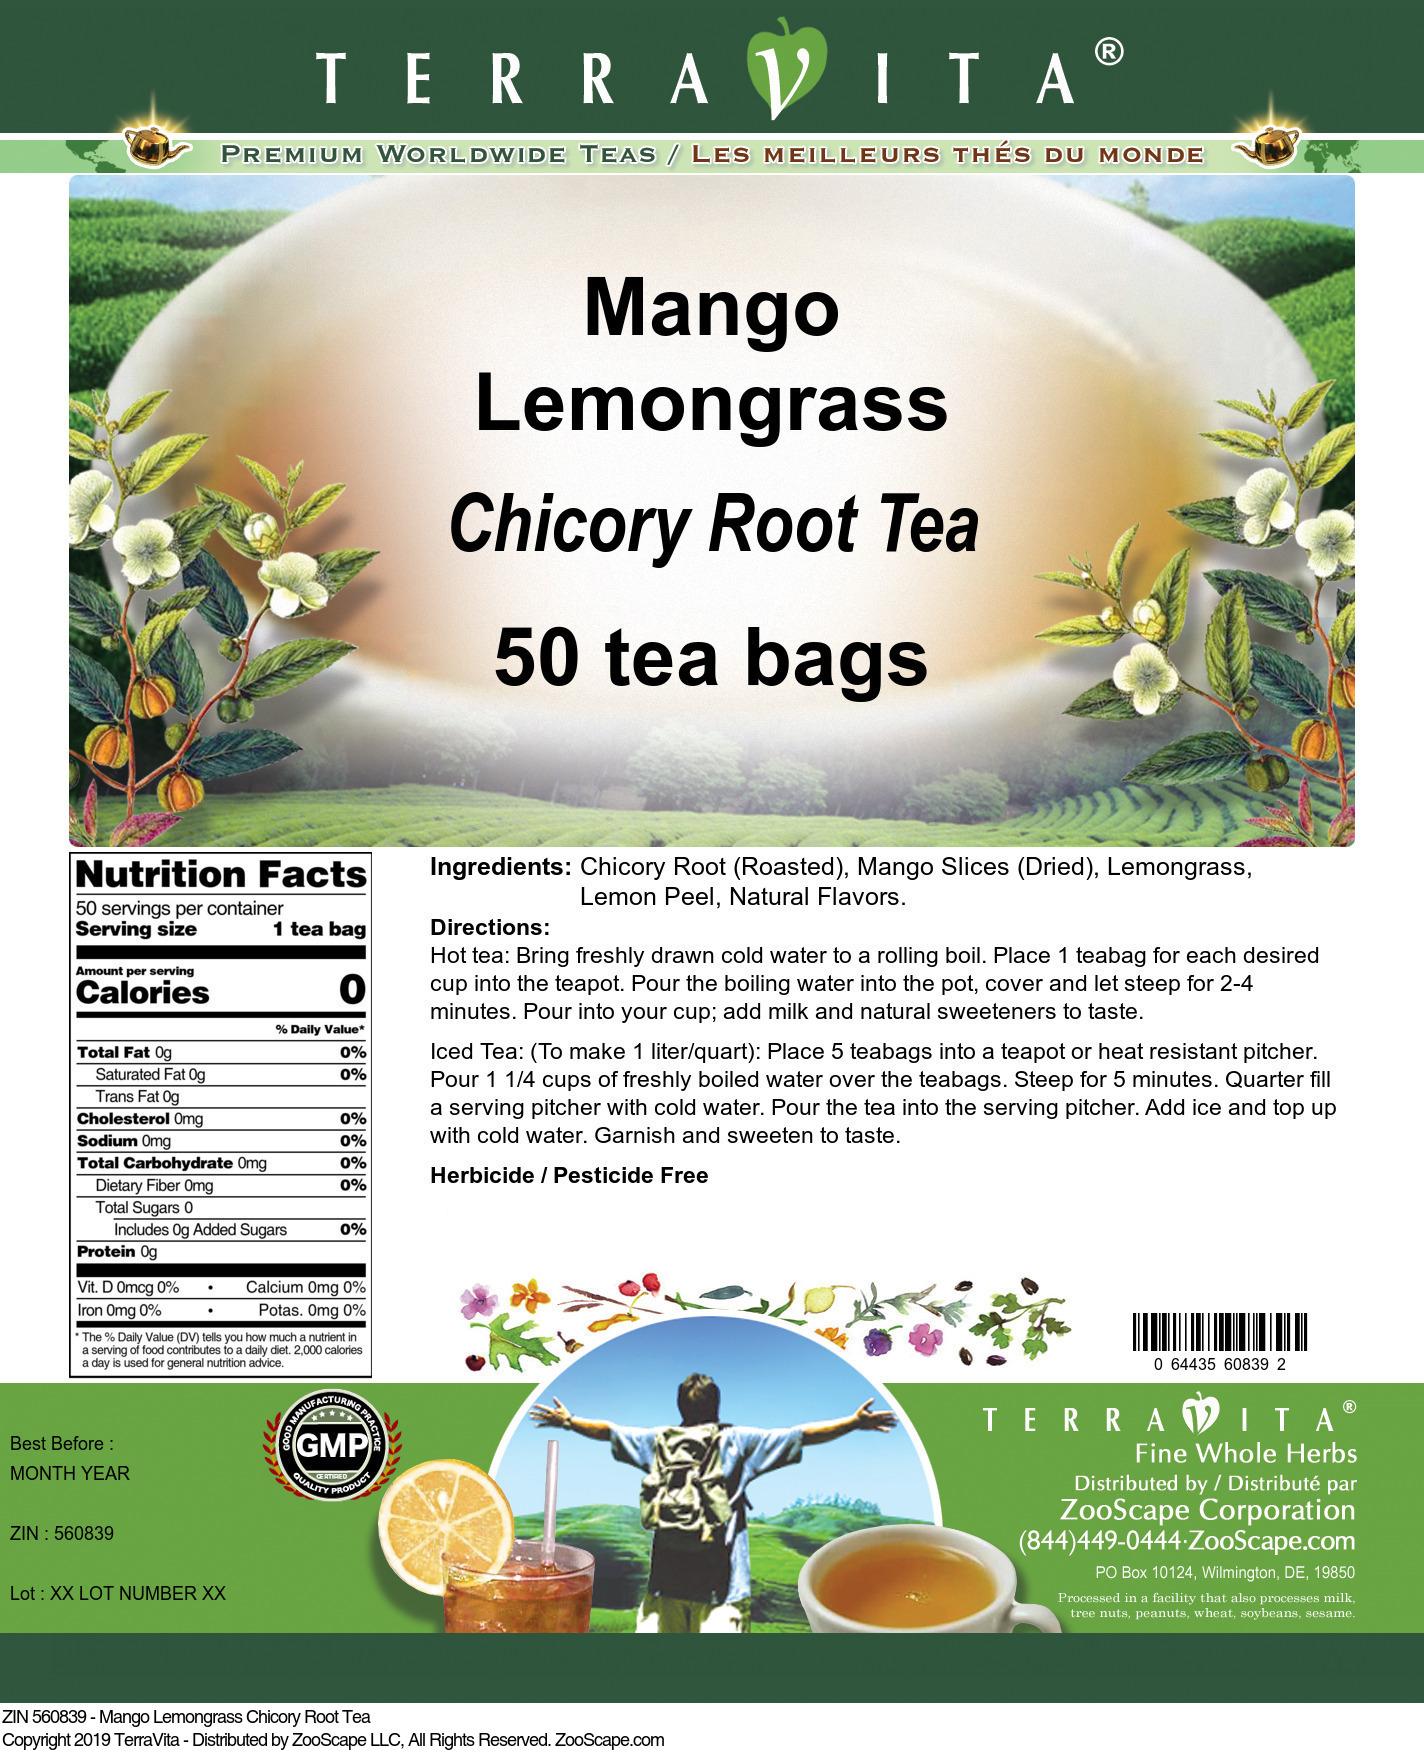 Mango Lemongrass Chicory Root